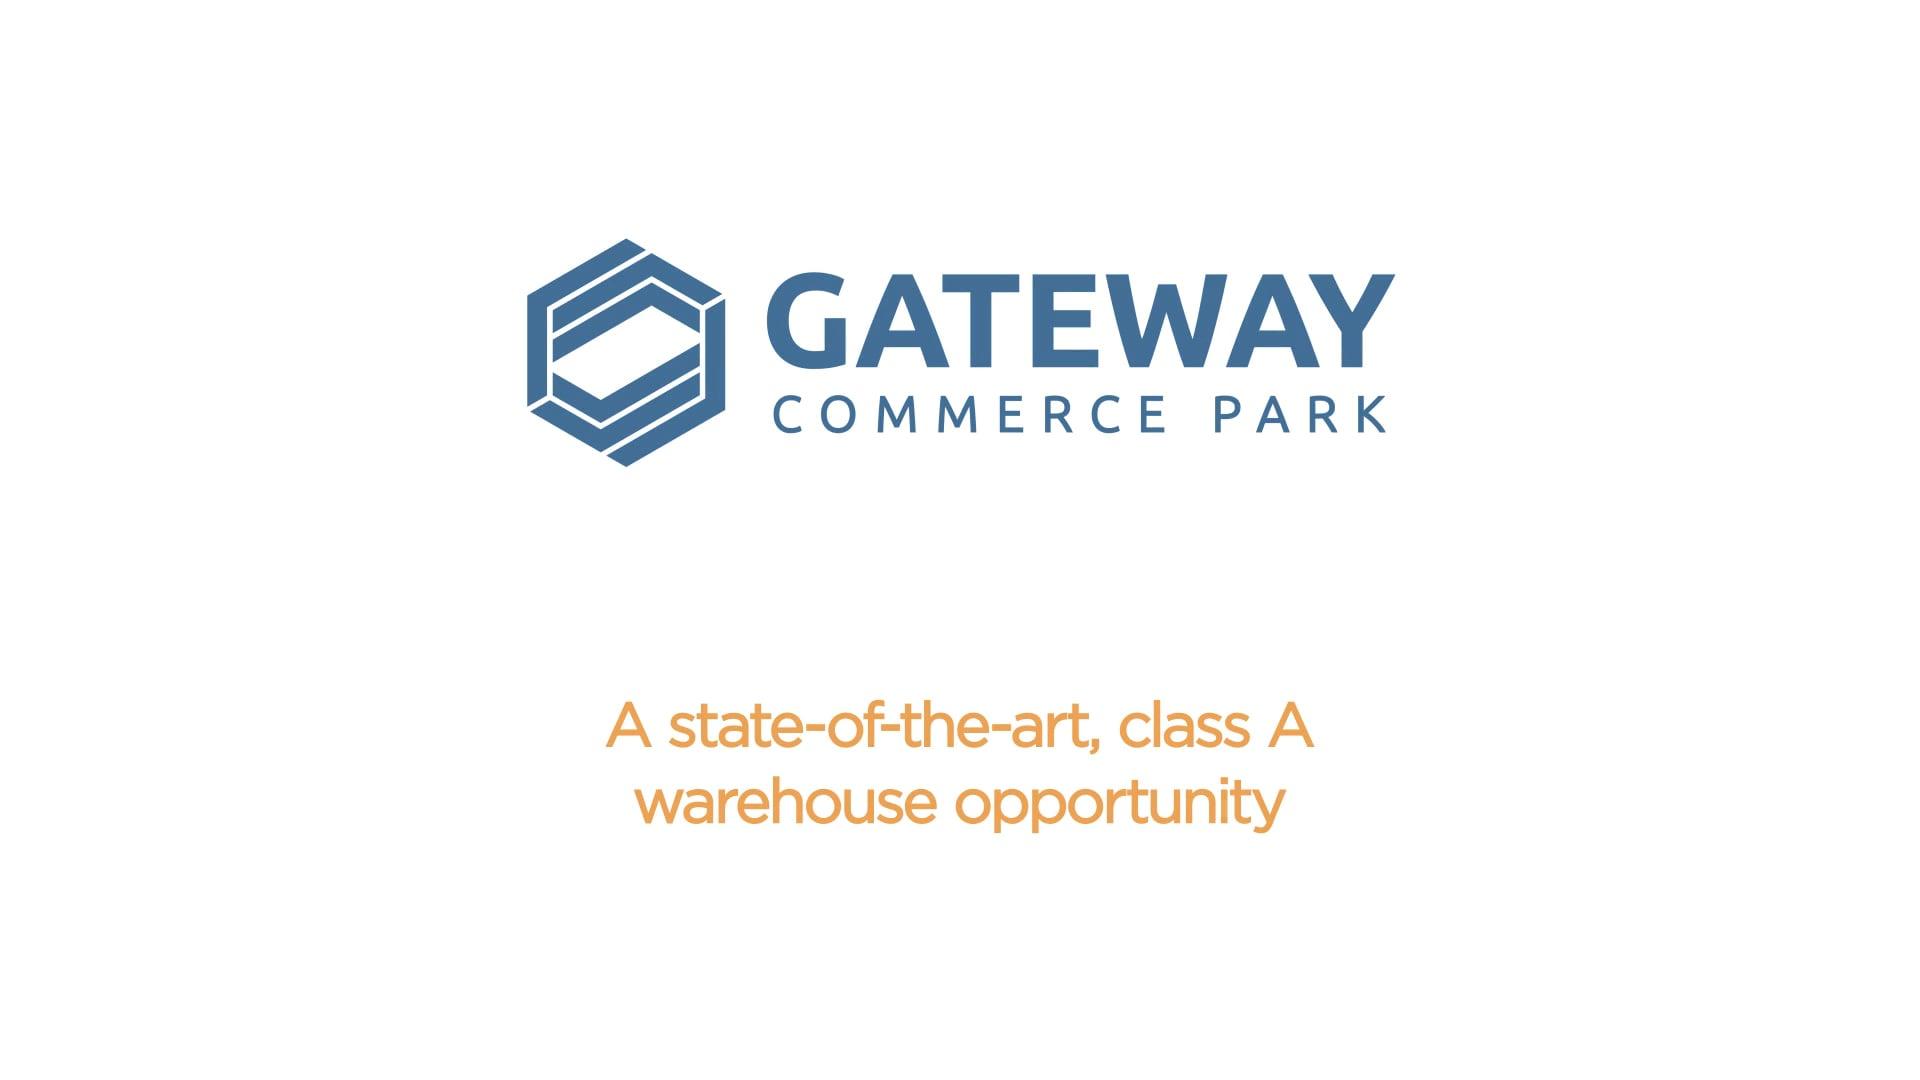 TM - Gateway Industrial Park